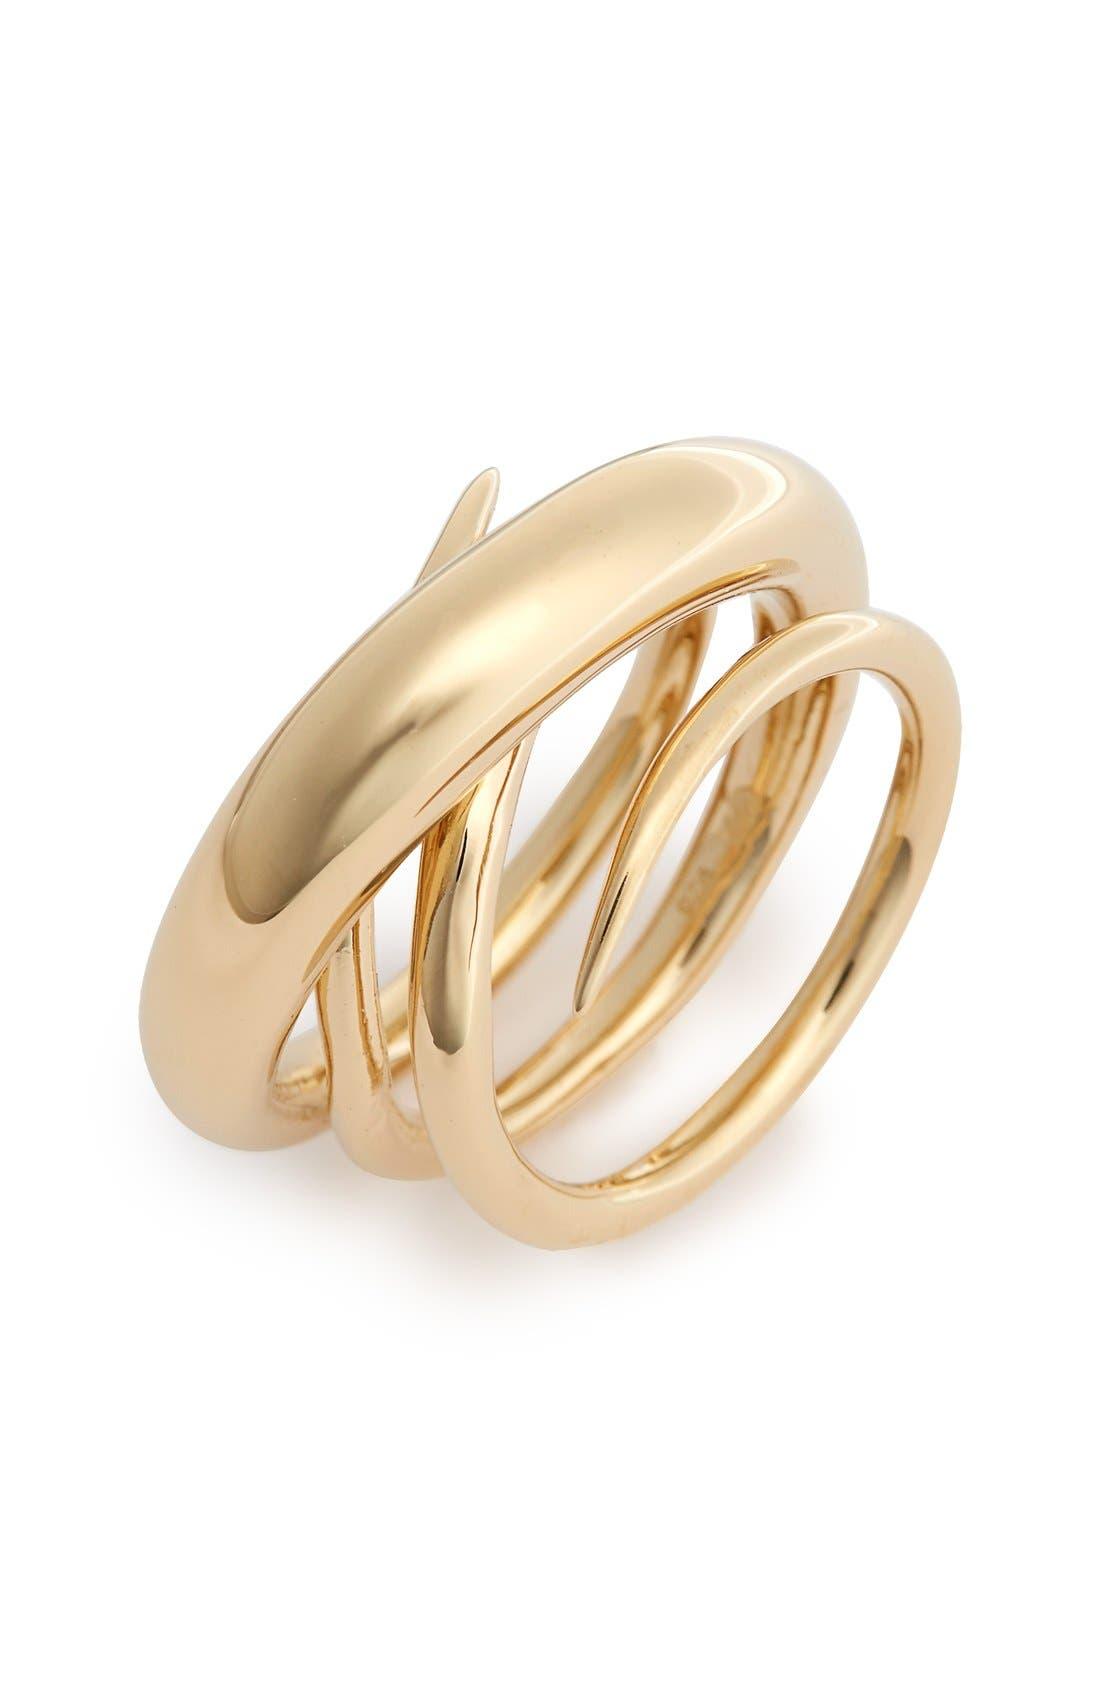 Main Image - Charlotte Chesnais 'Hurly Burly' Ring